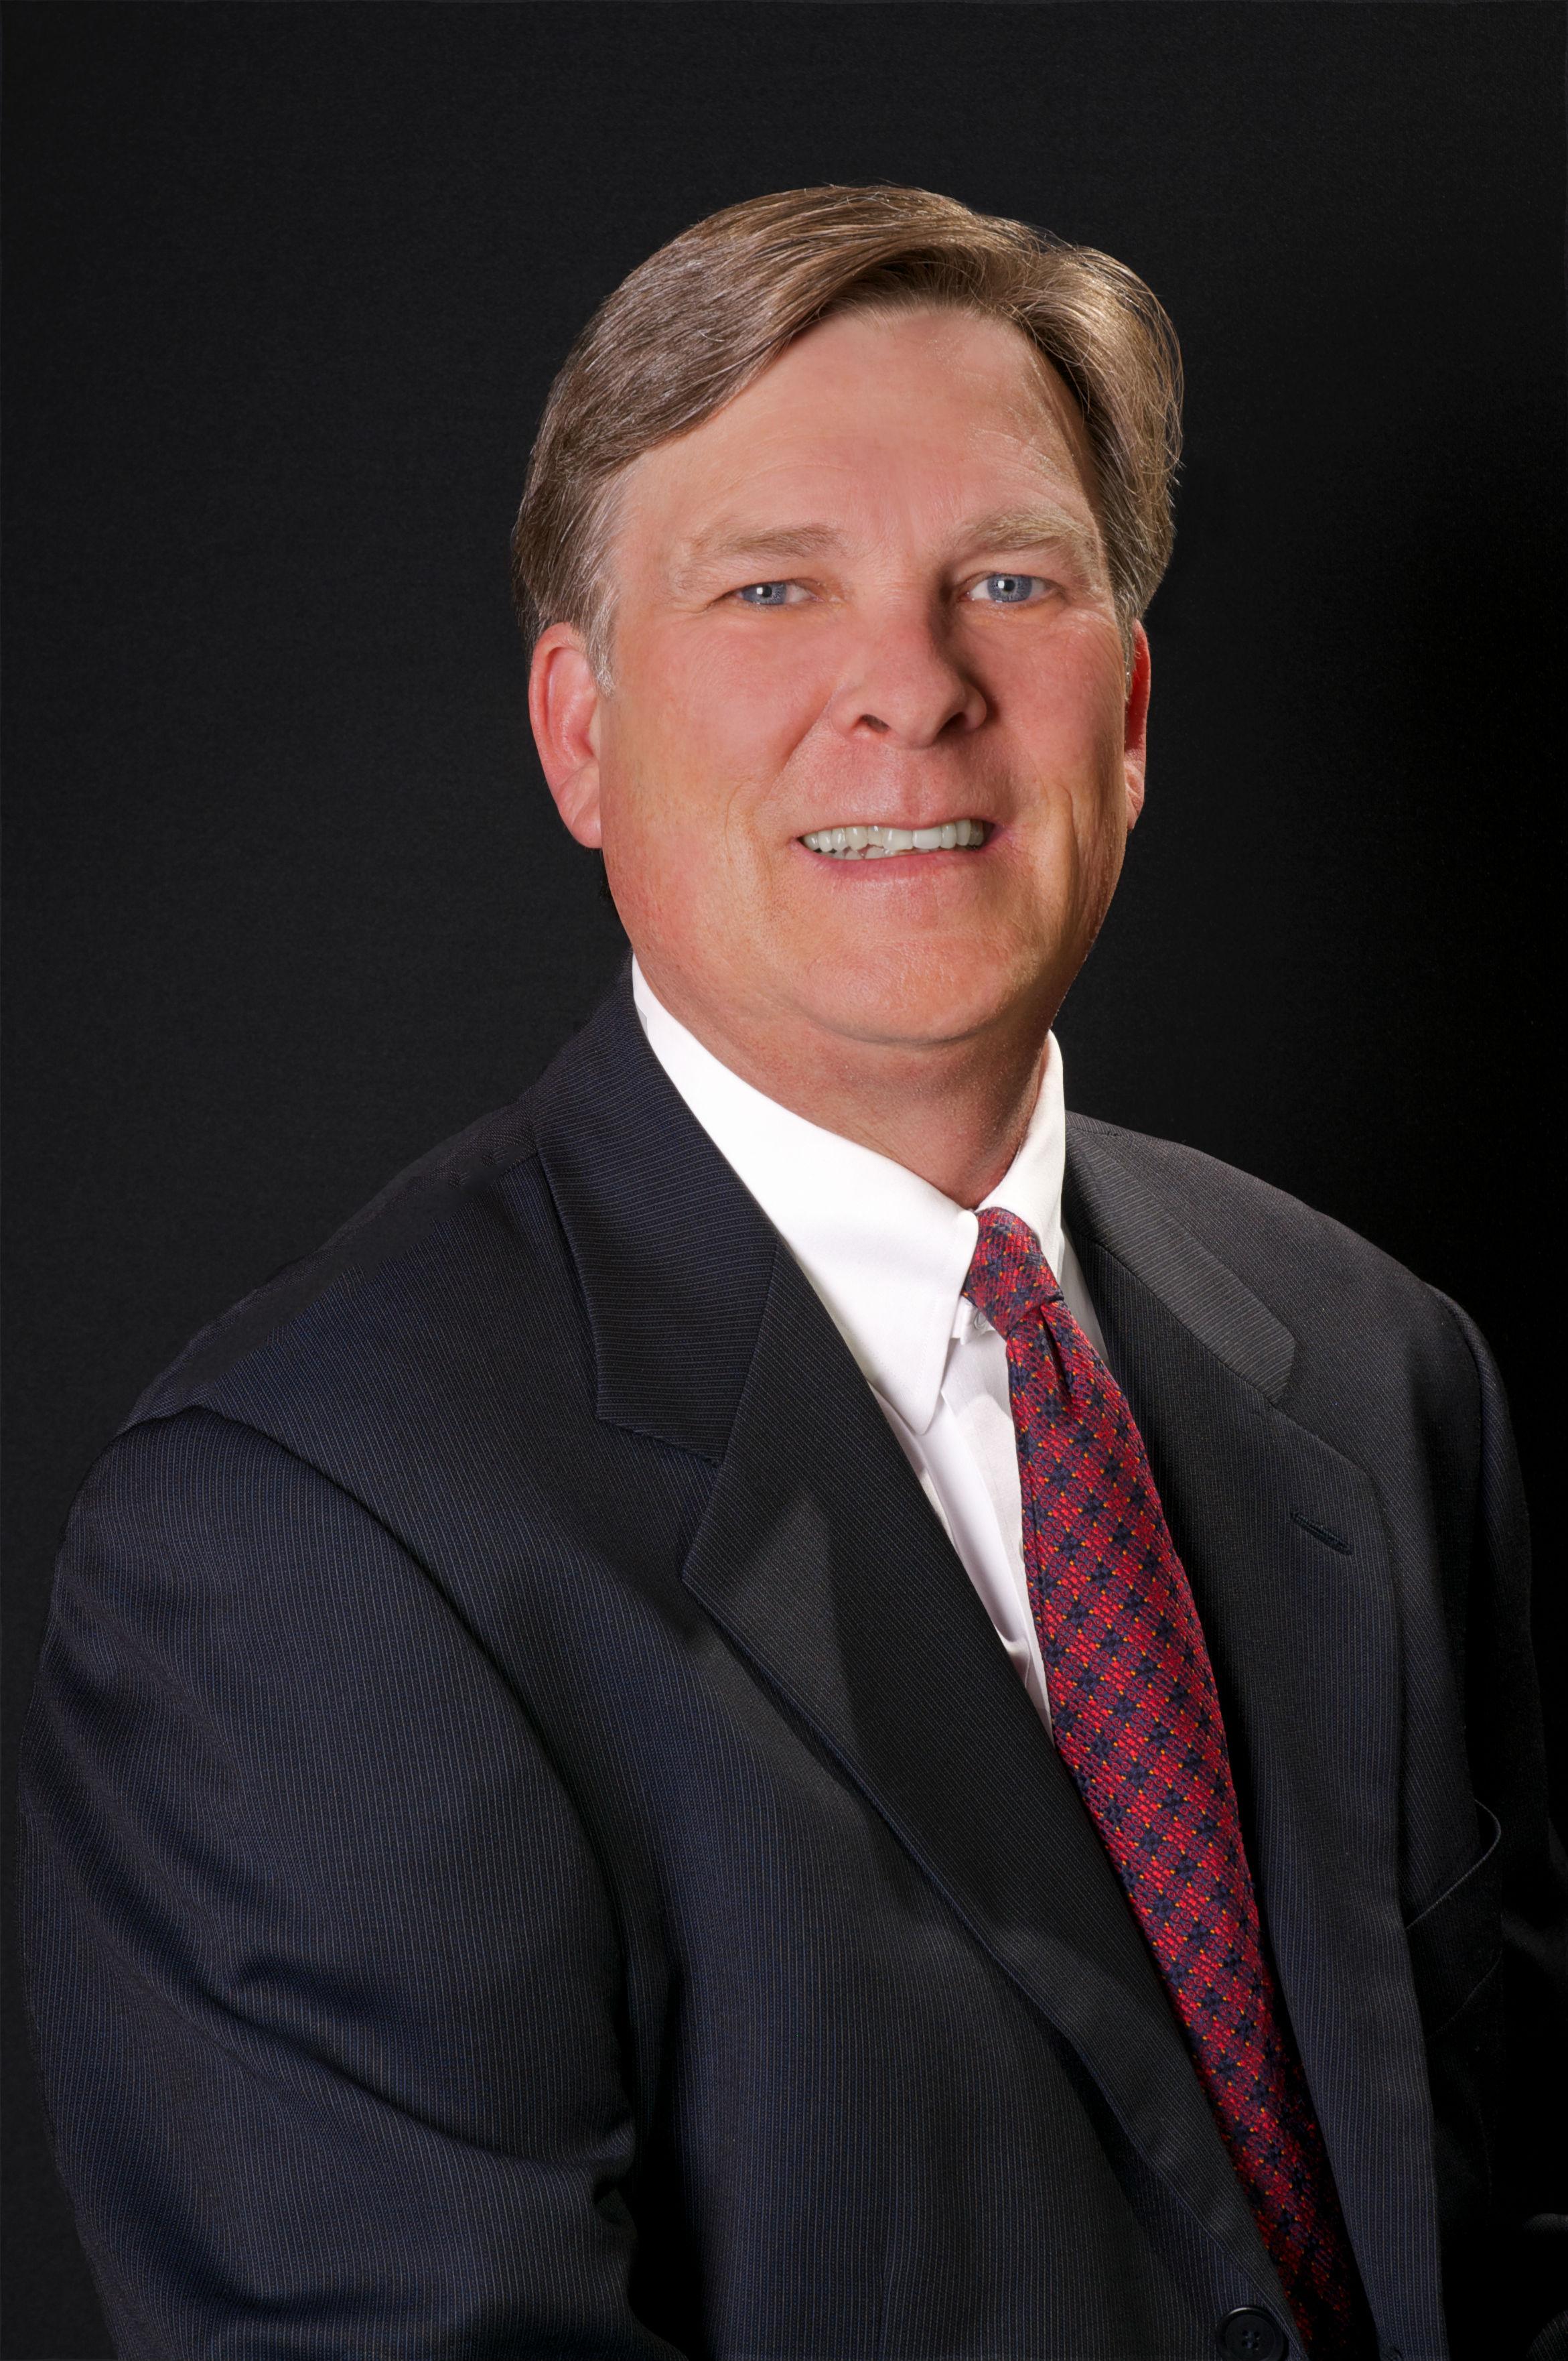 Stephen Meyer